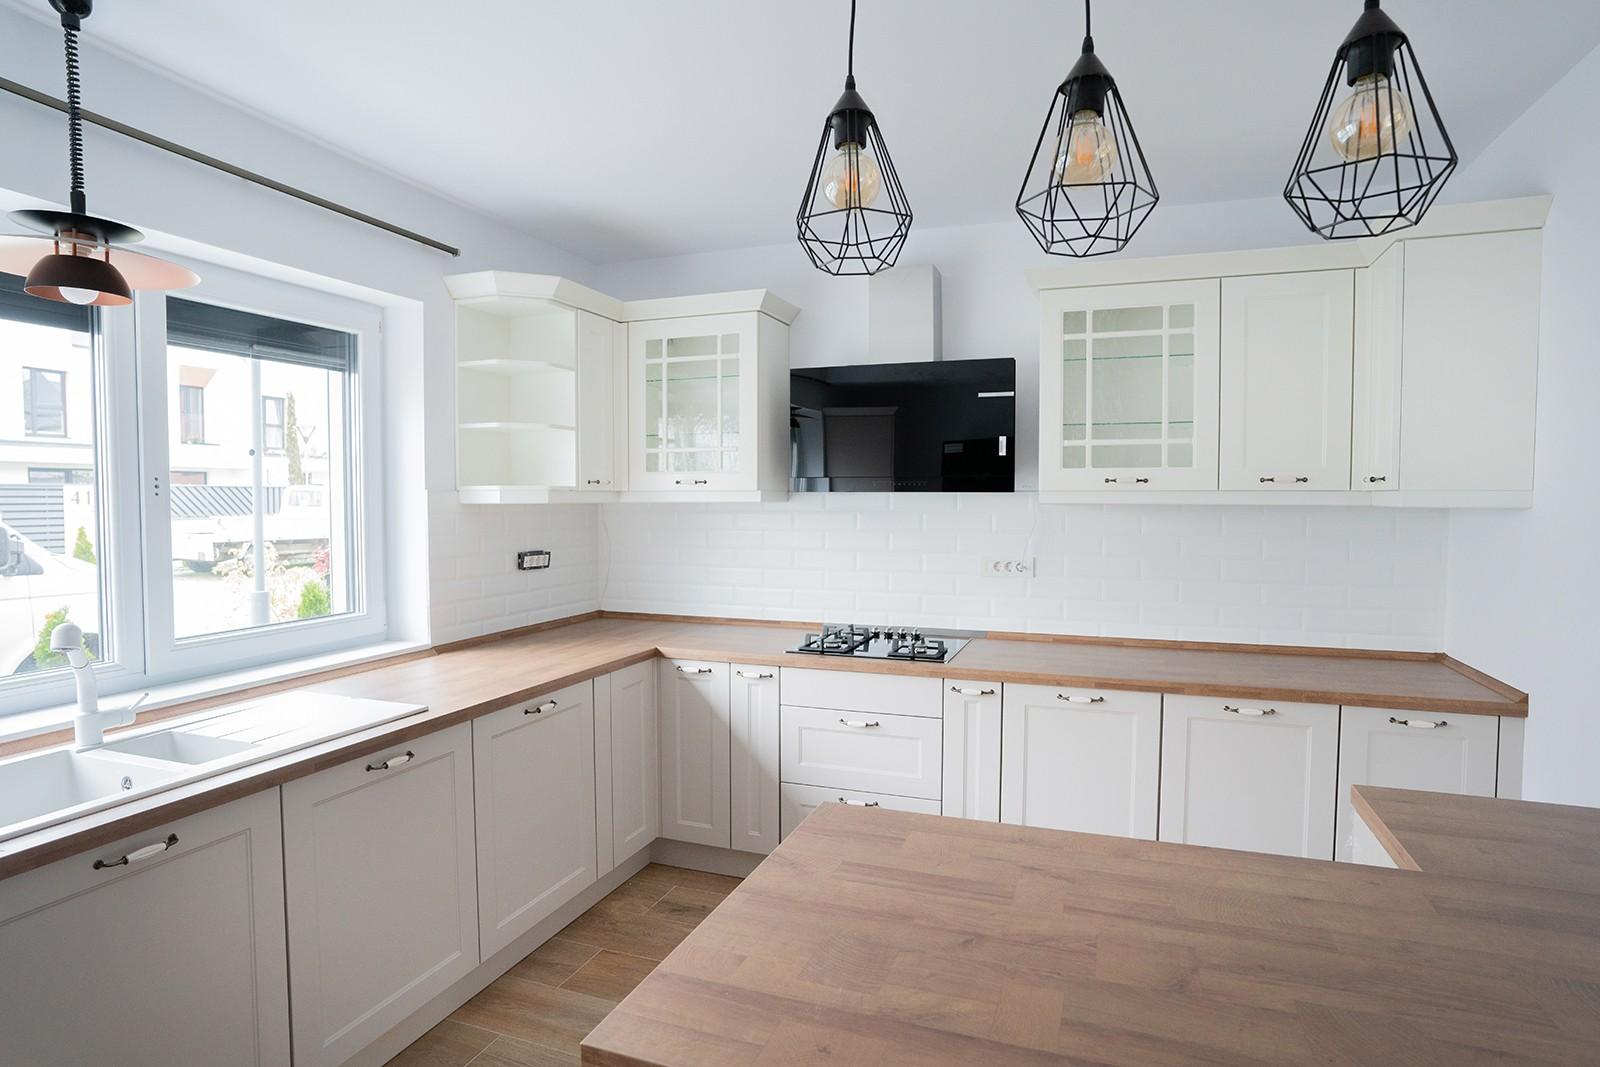 Referință - Bucătărie rustică Nobilia Chalet - Nisip / Stejar